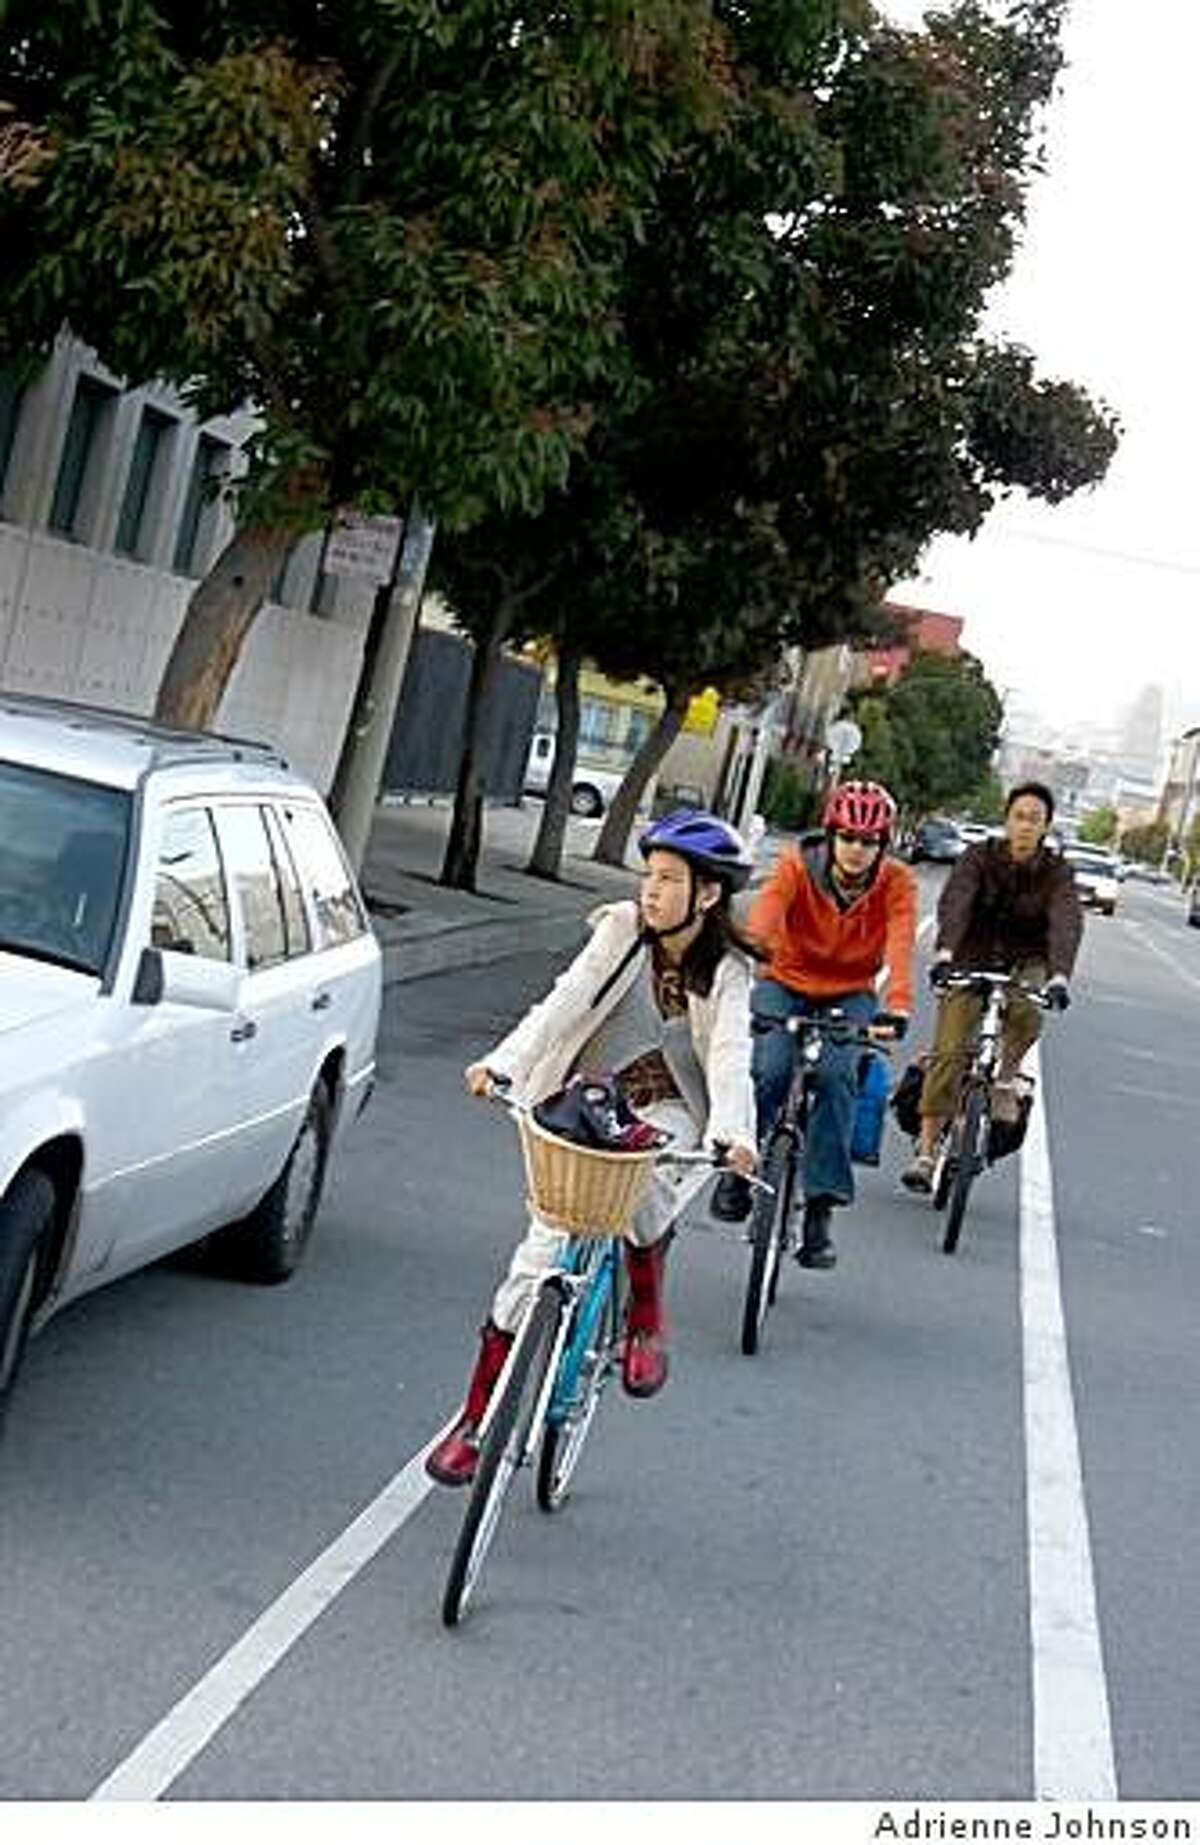 Adrienne Johnson's 10-year-old daughter �na biking on San Francisco's Valencia Street.